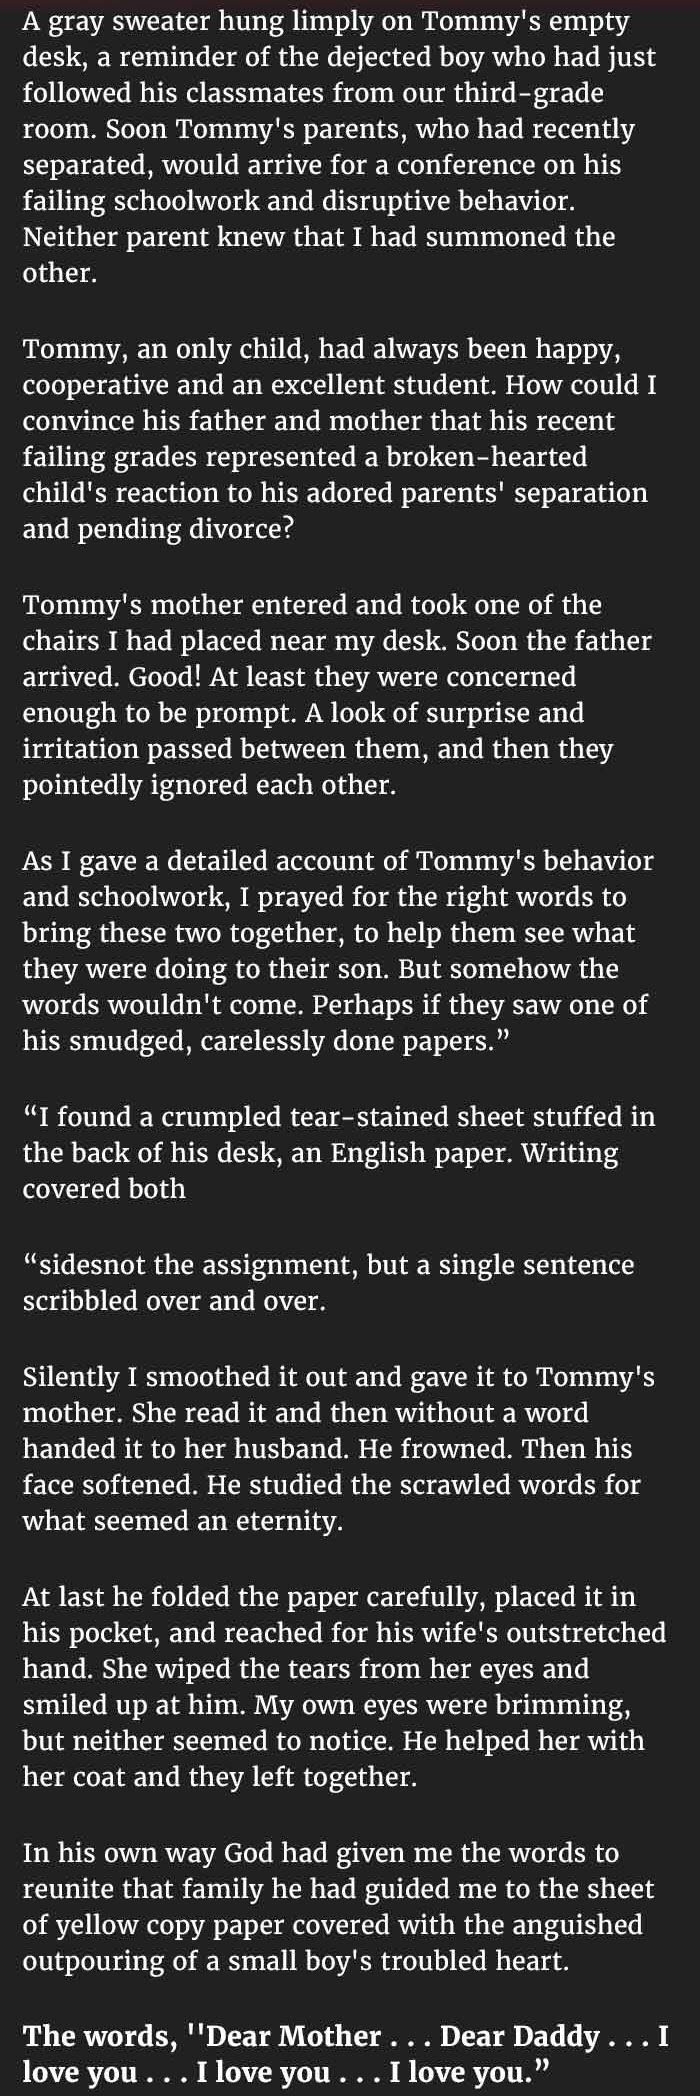 teacher summoned parents